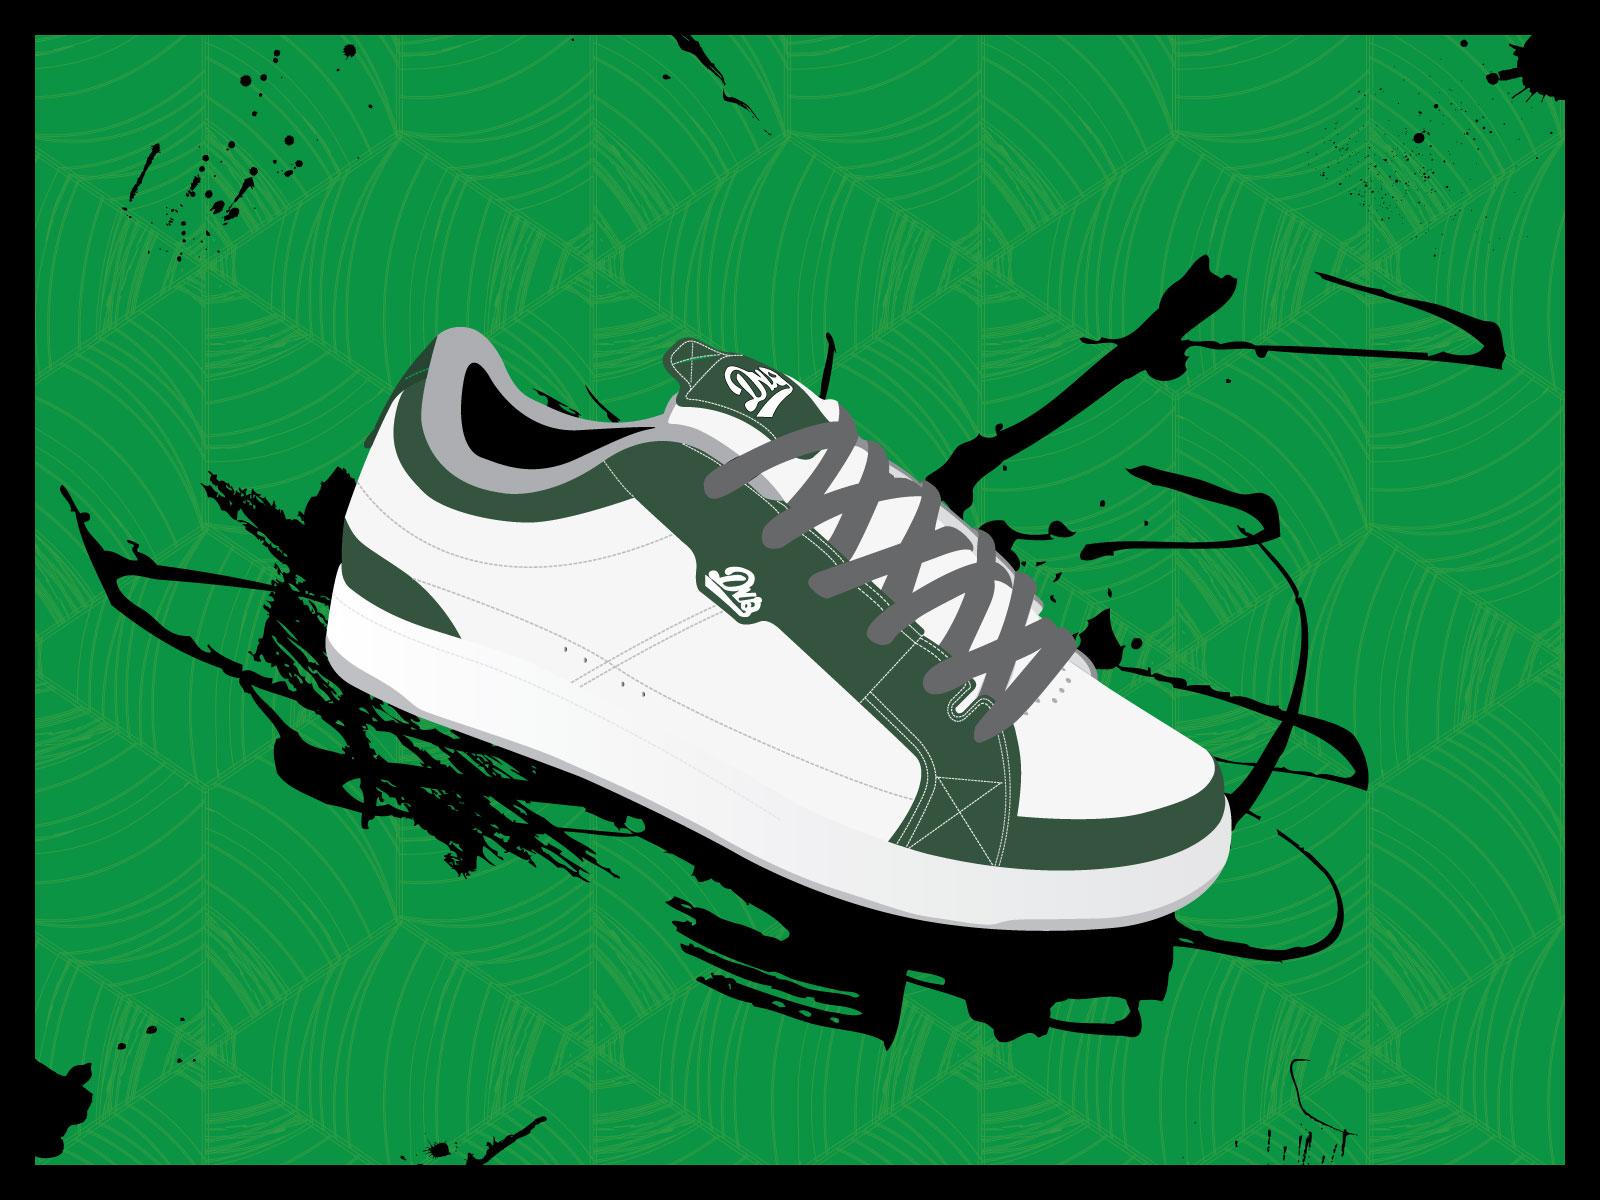 Green Shoe by Pavu1on